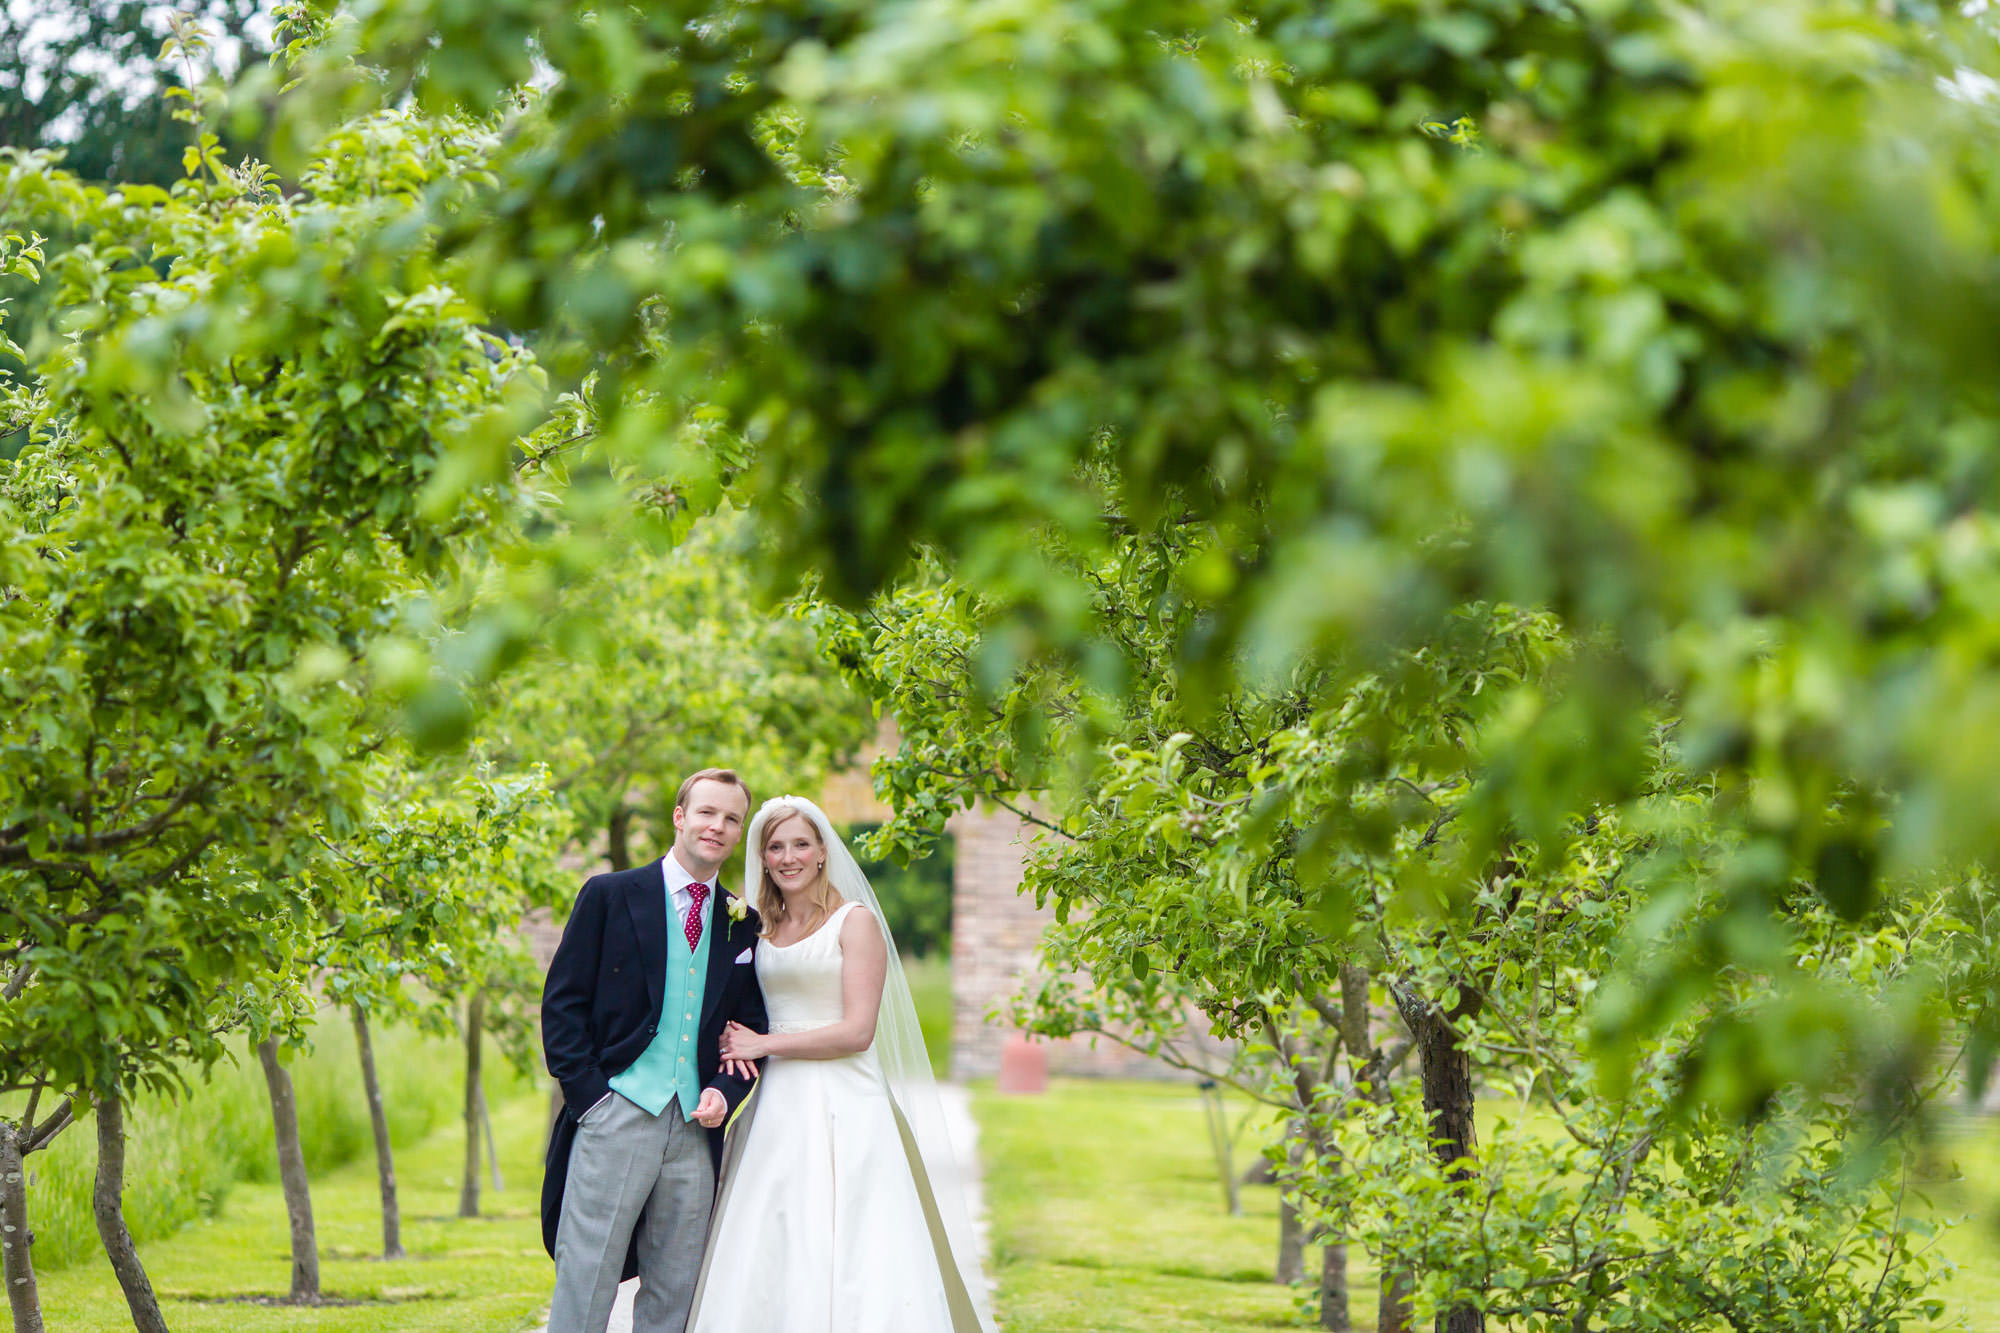 Wedding photos at Fulham Palace